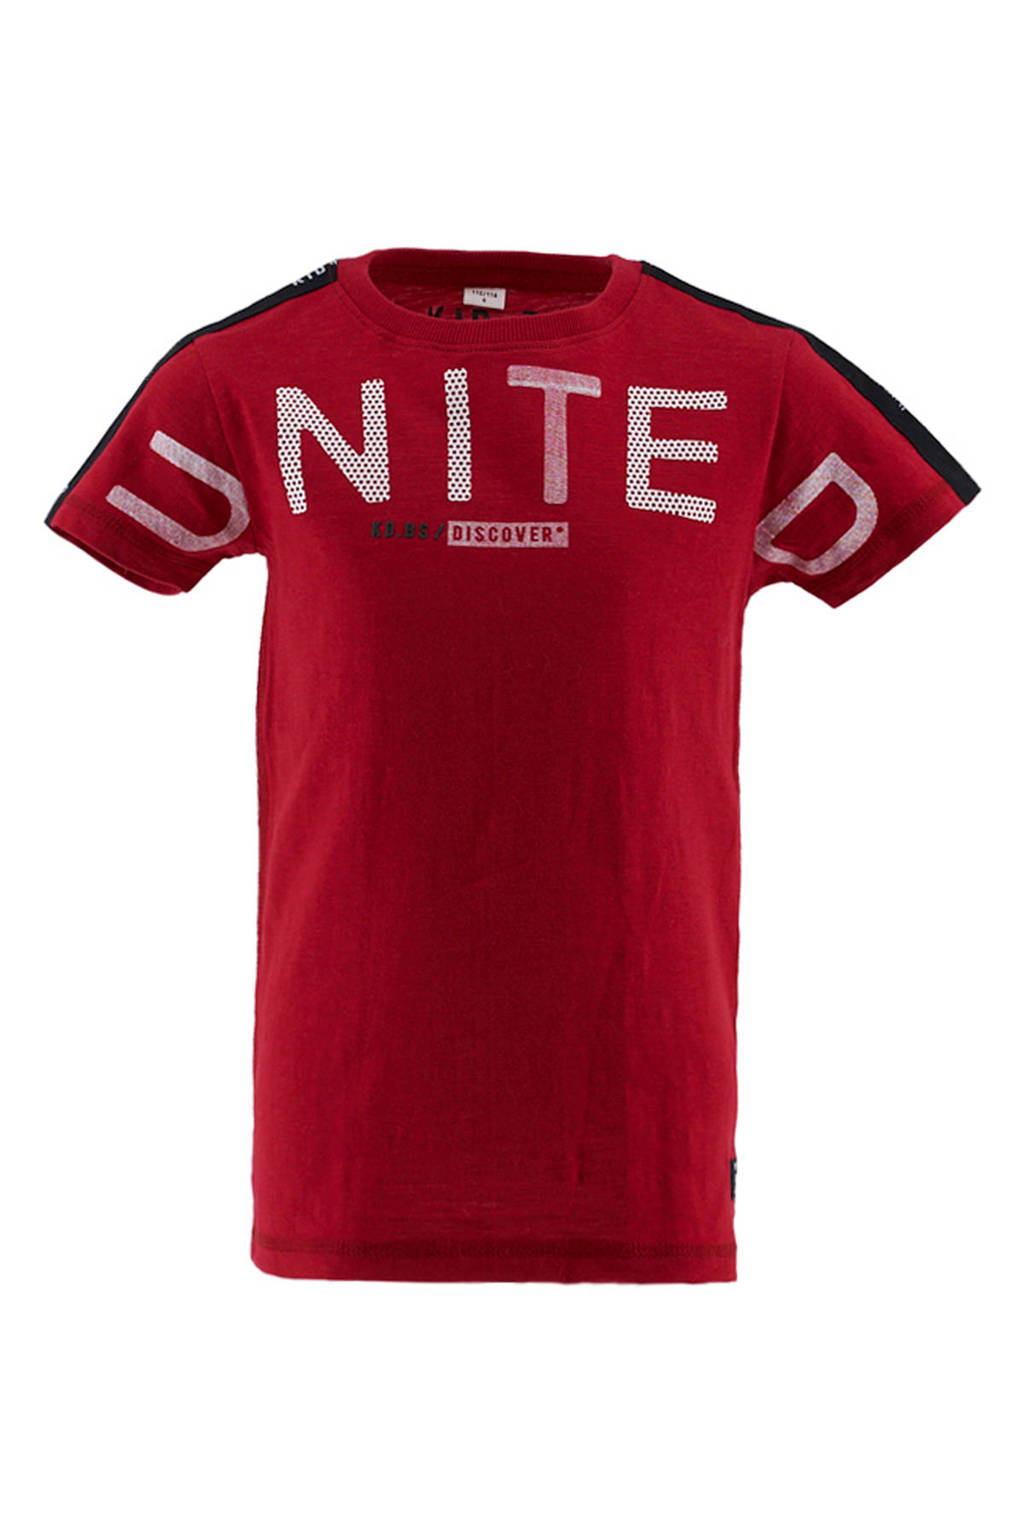 KIDDO T-shirt met contrastbies rood, Rood